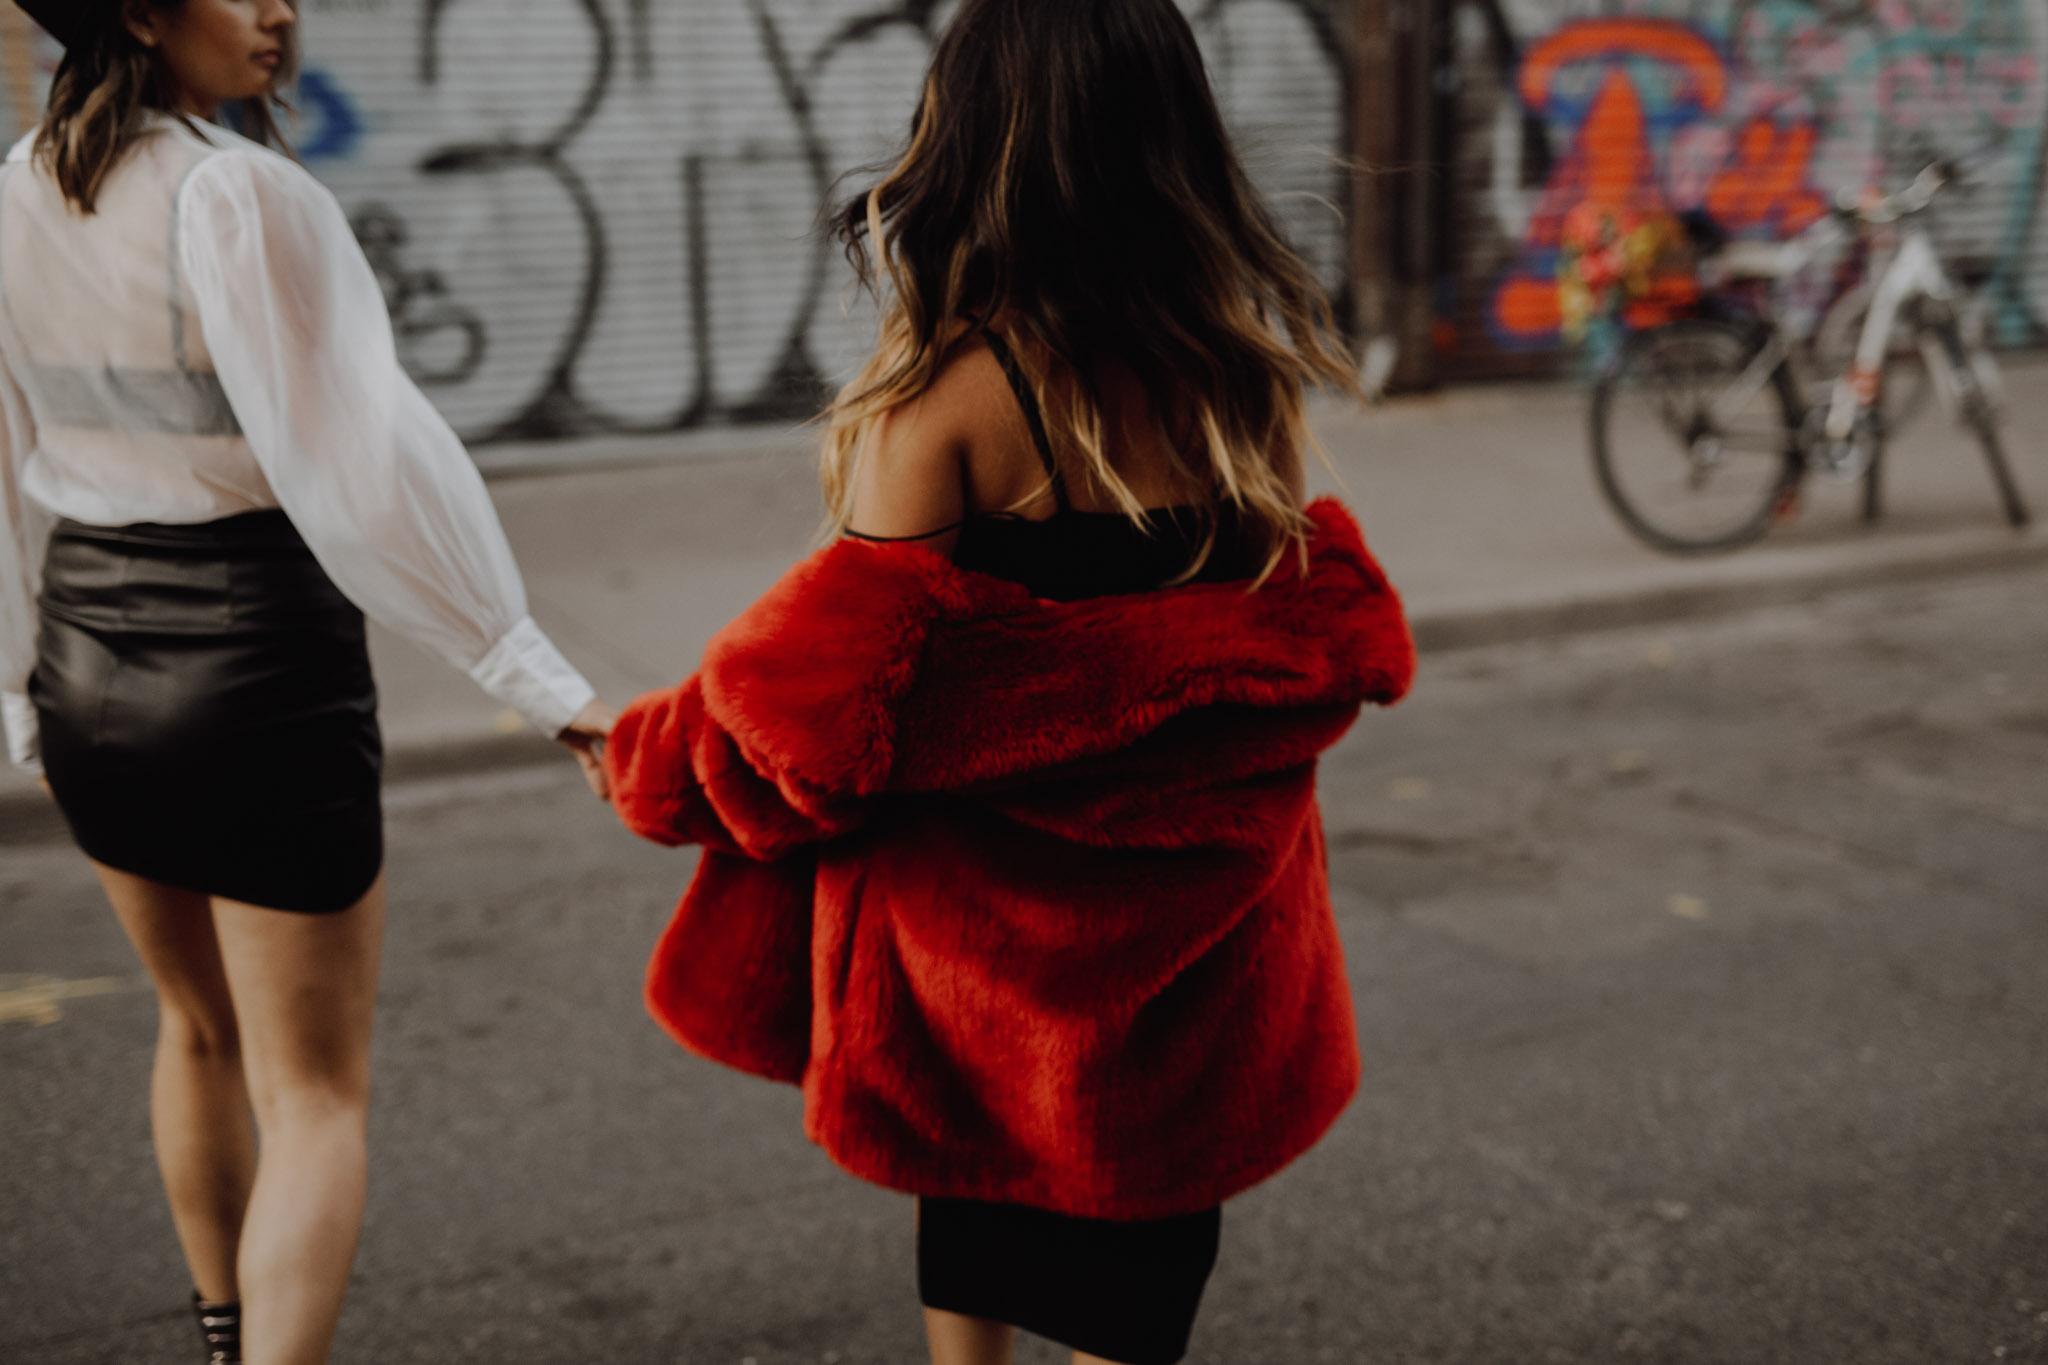 Mcdonalds engagement session - red coat